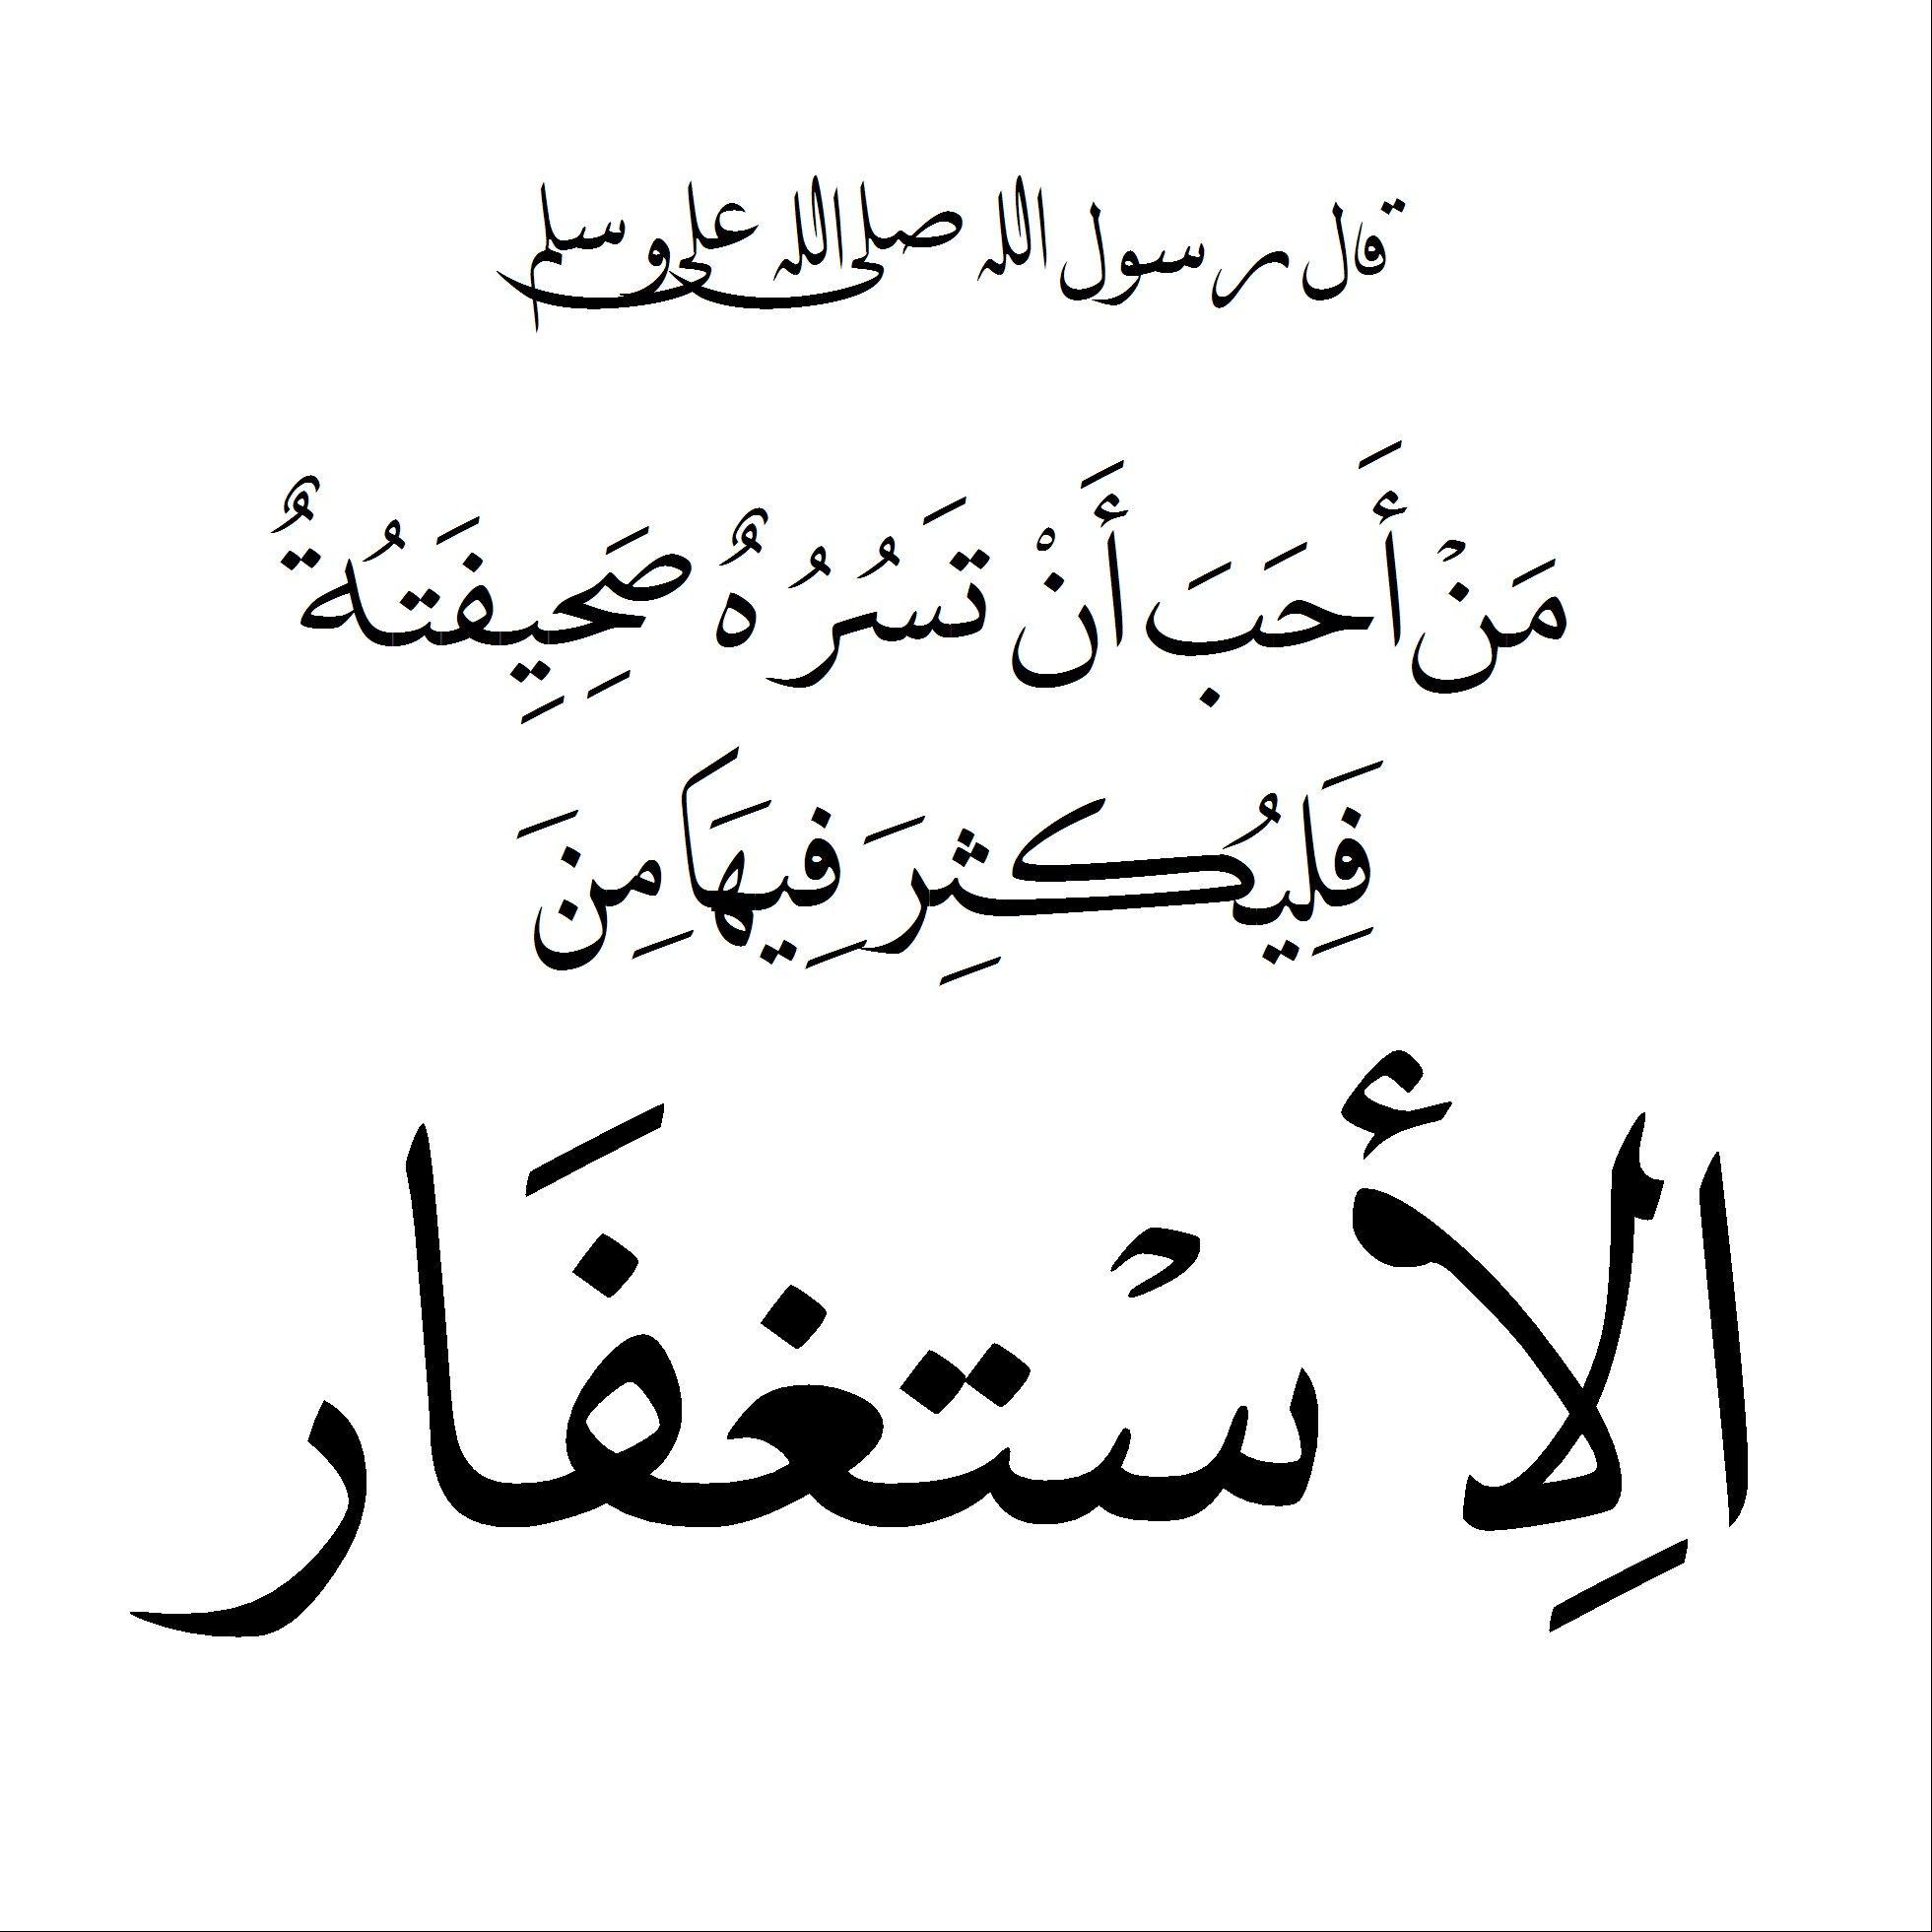 فقلت استغفروا ربكم انه كان غفارا Quran Verses Islamic Inspirational Quotes Holy Quran